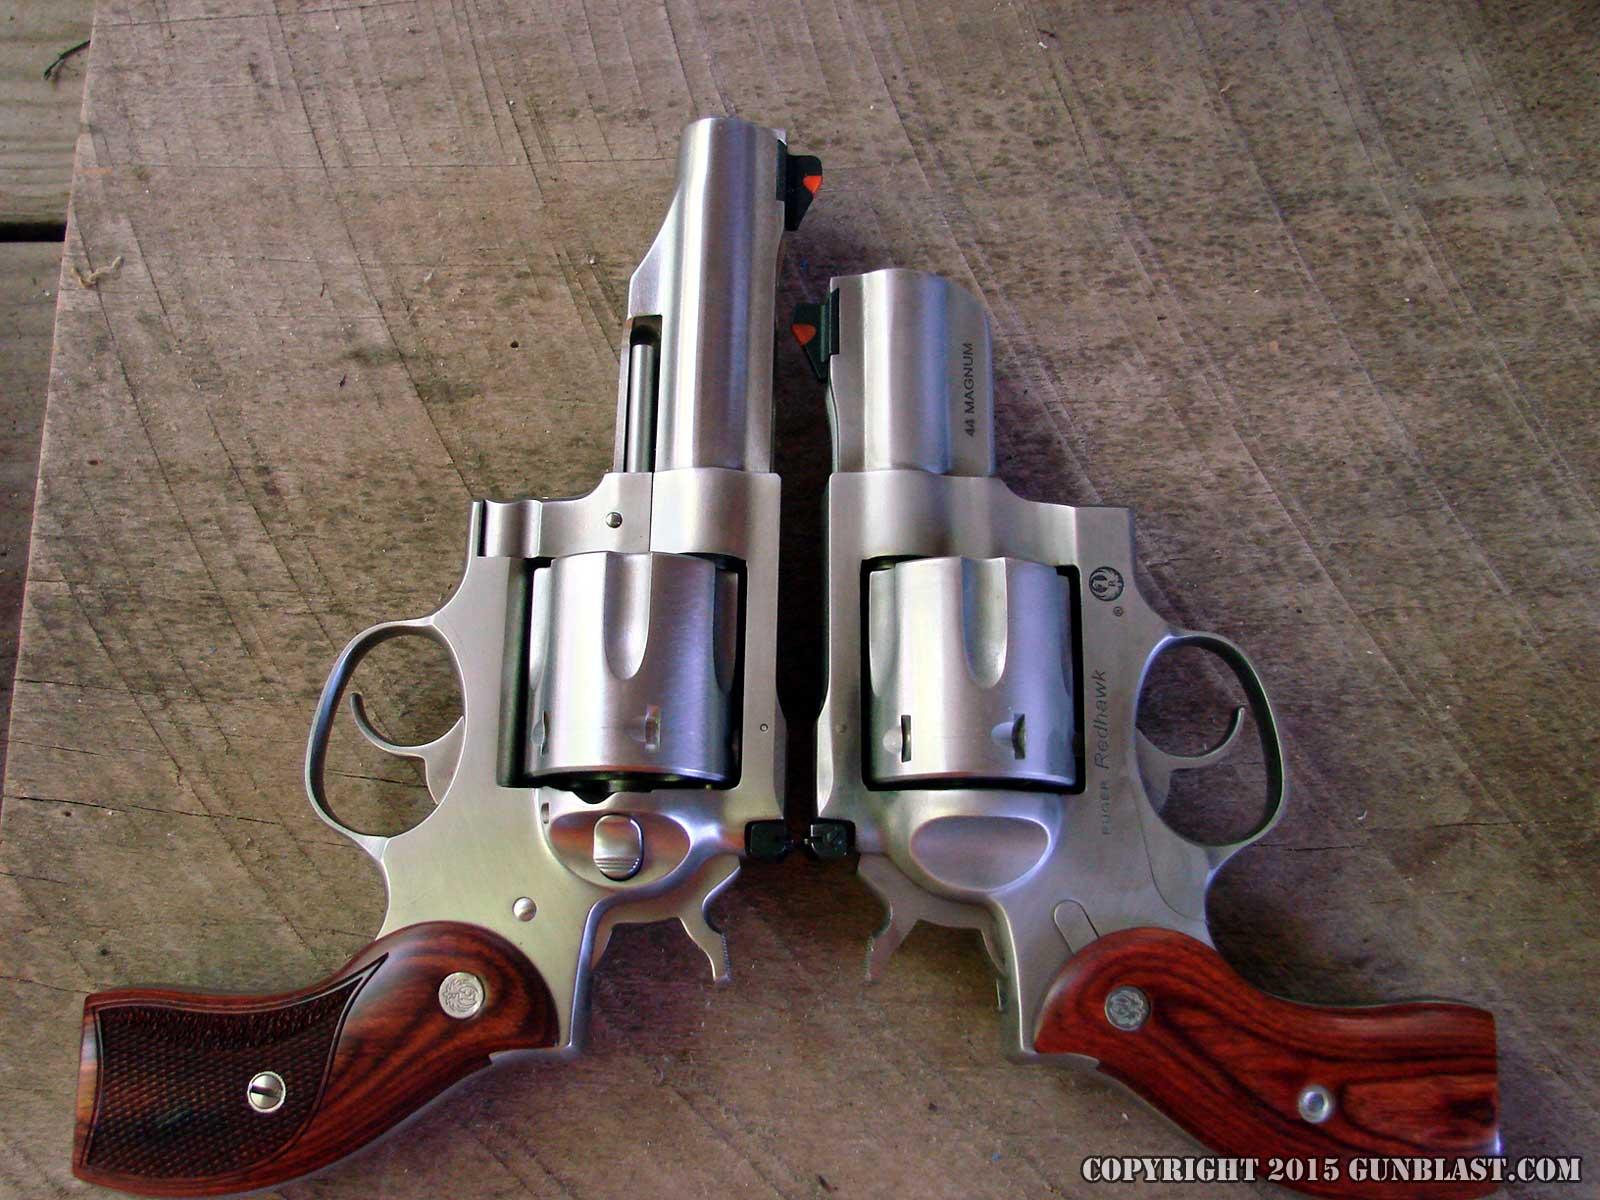 Davidson's Exclusive Ruger Redhawk 41 Magnum, and Ruger